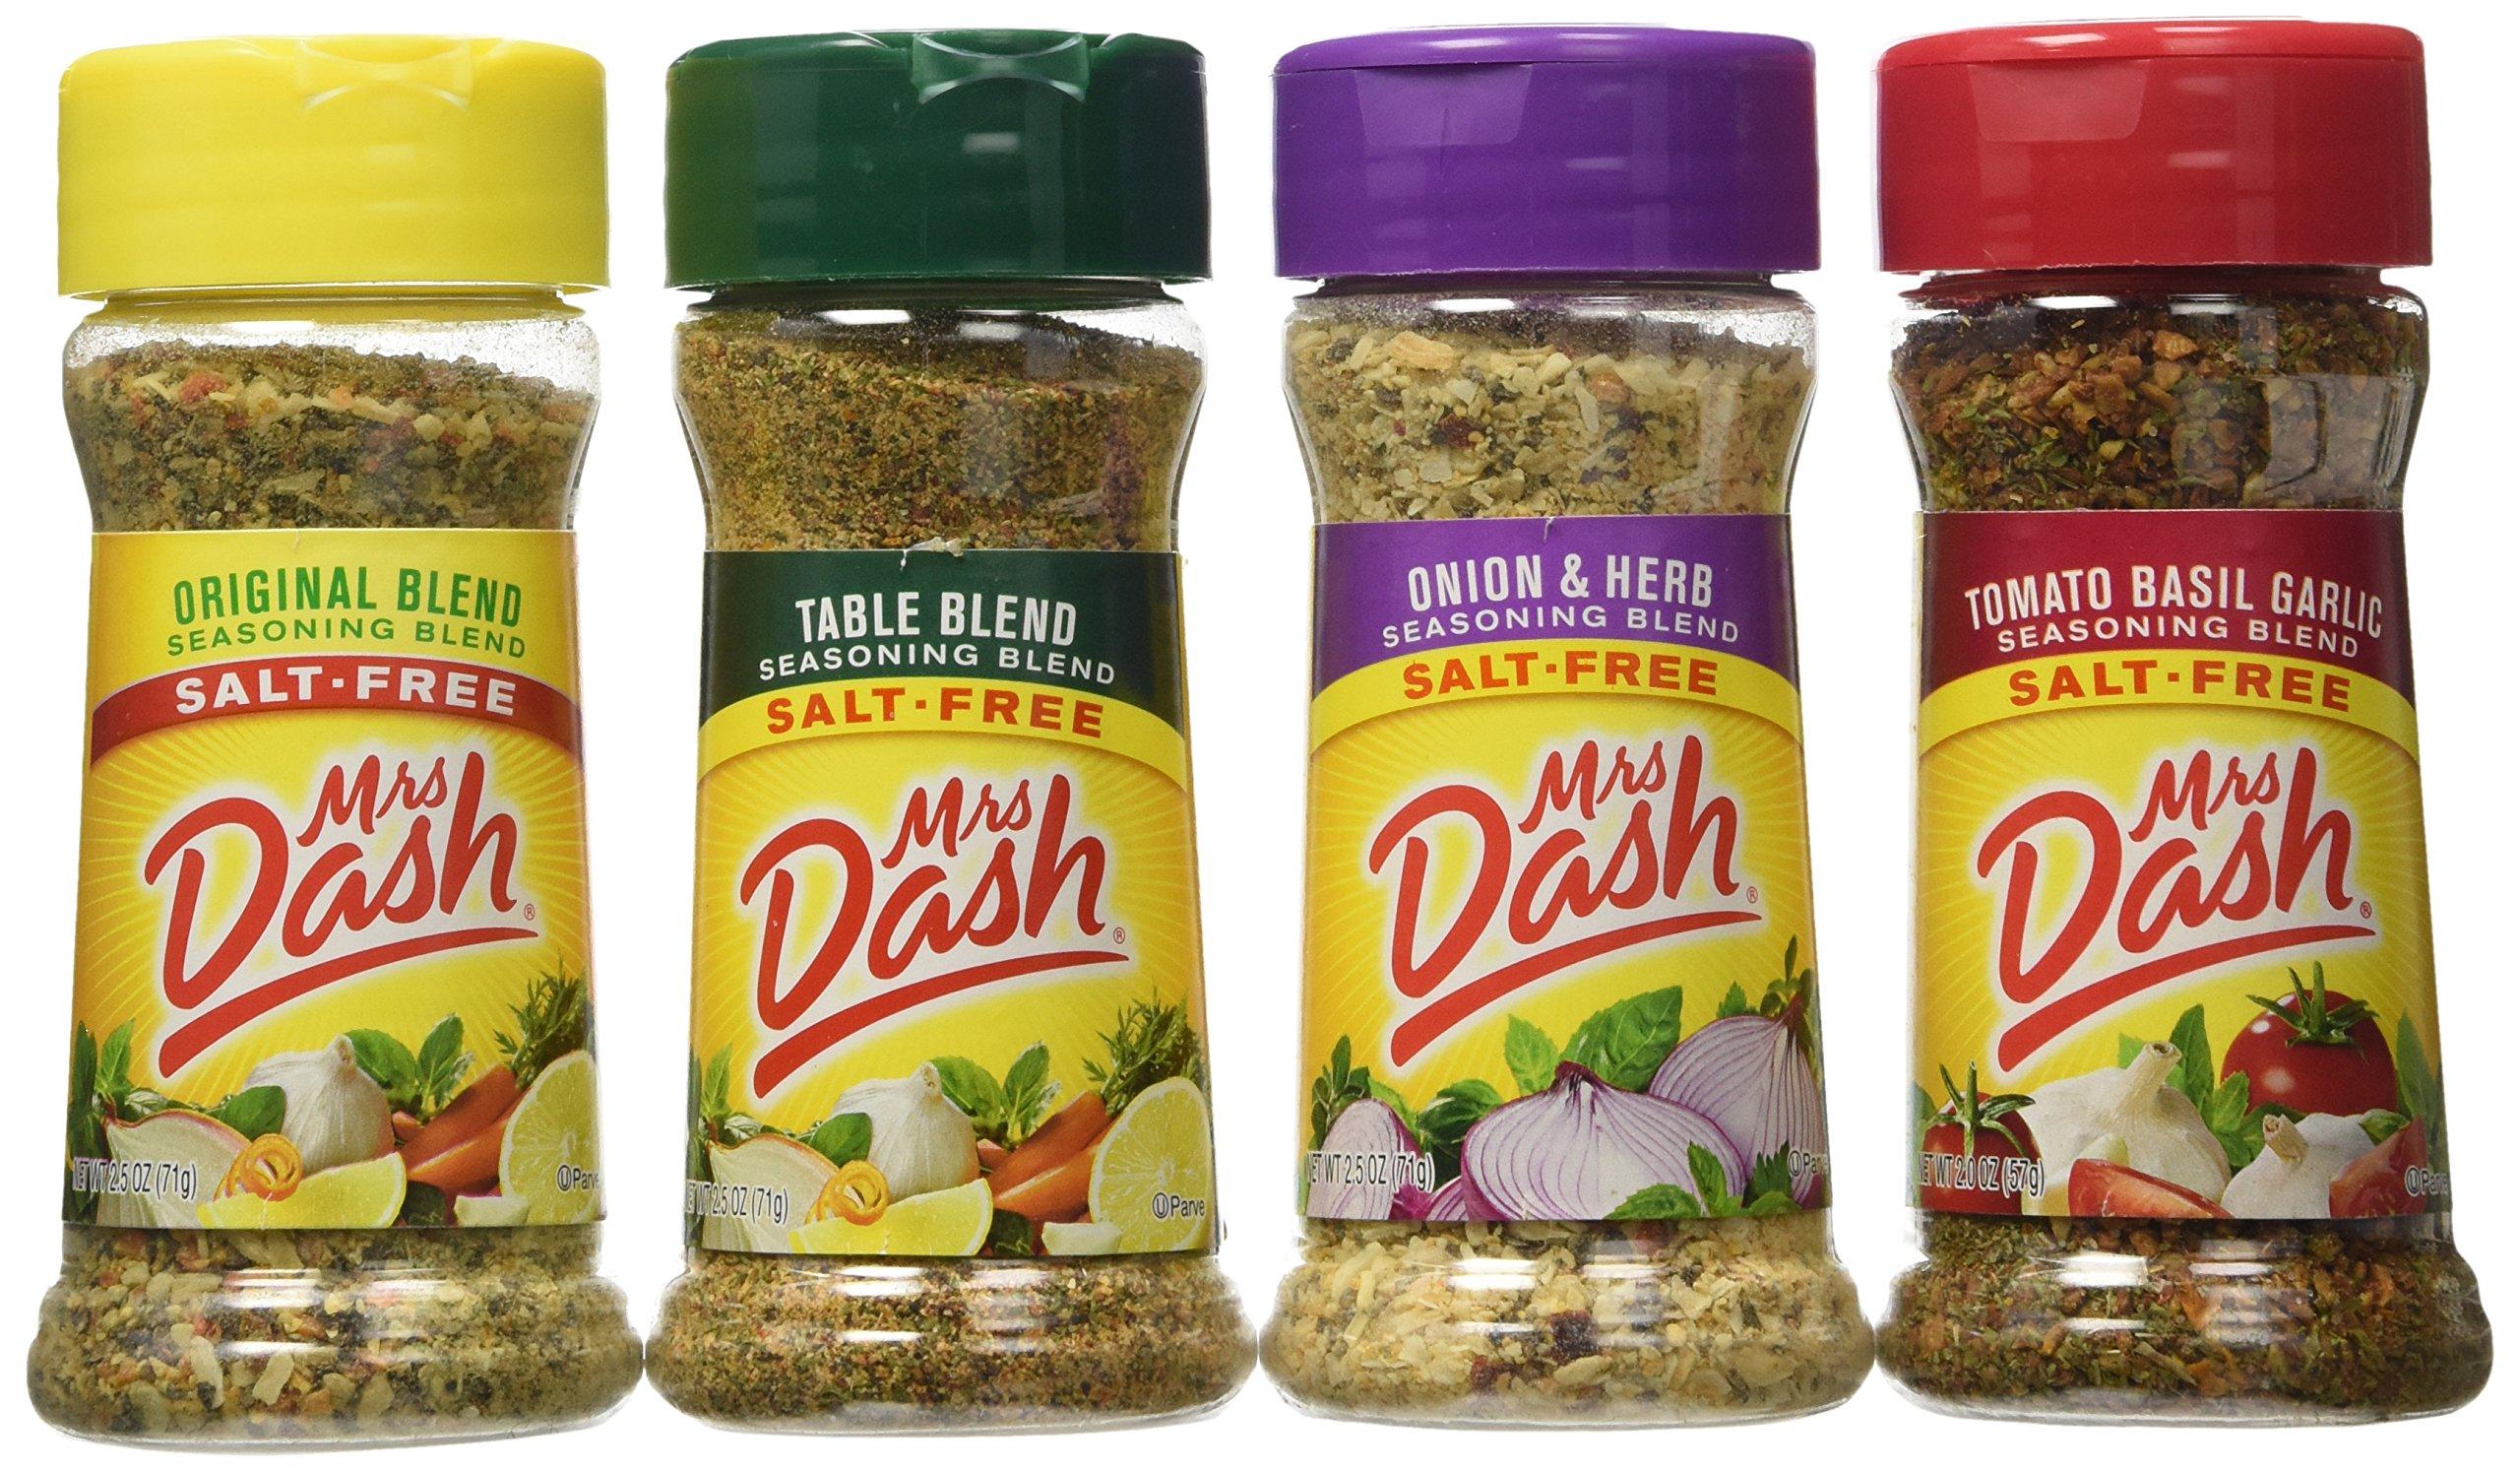 Mrs. Dash Seasoning Blends Variety Flavor 4 Pack 2.5 oz – Onion & Herb - Table Blend - Tomato Basil Garlic - Original Blend Set Bundle